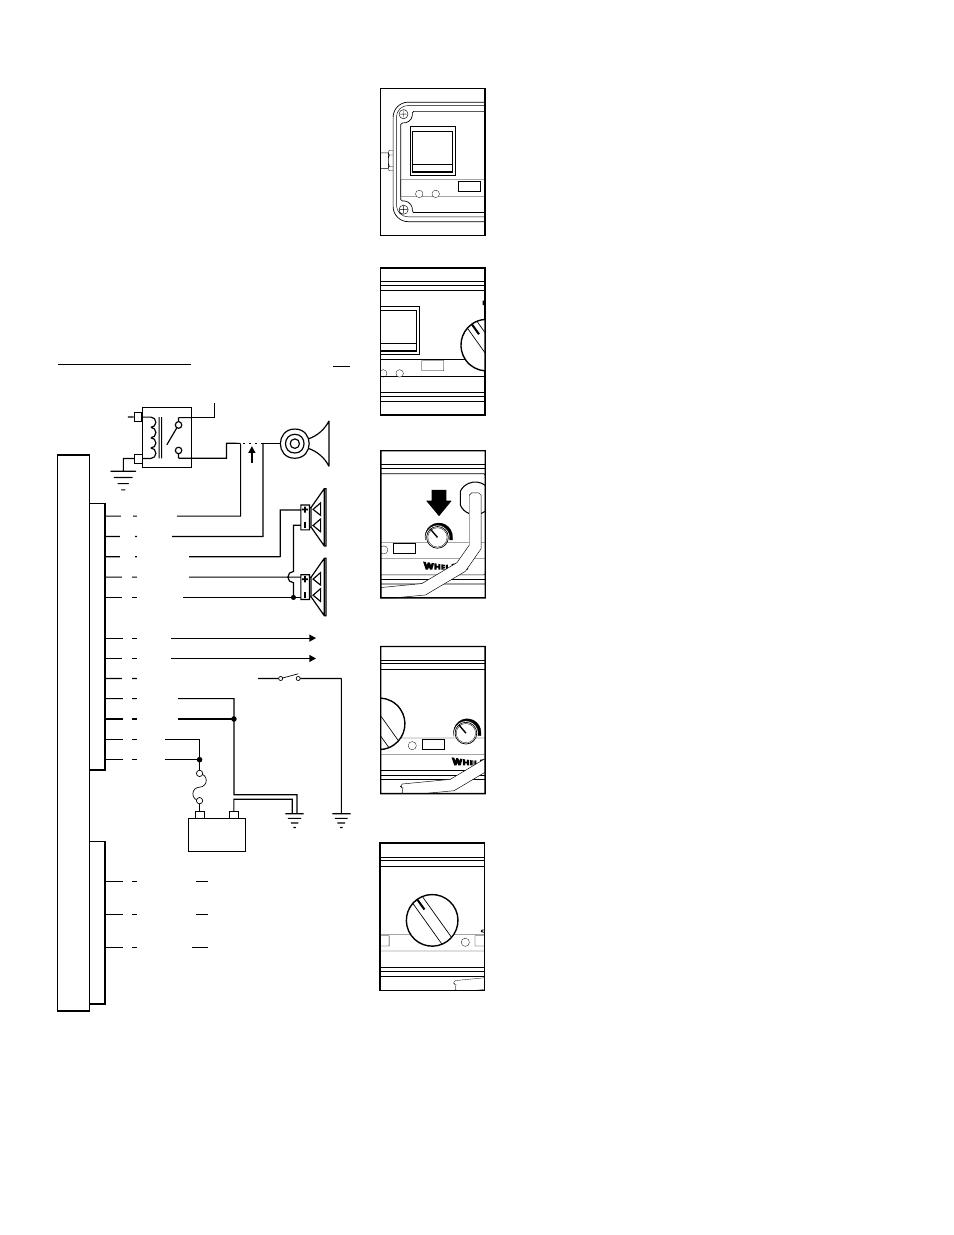 DIAGRAM] Elite Light Bar 911ep Galaxy Wiring Diagram FULL Version HD  Quality Wiring Diagram - GINDIAGRAM.SORAGNAWEB.ITSoragna Web